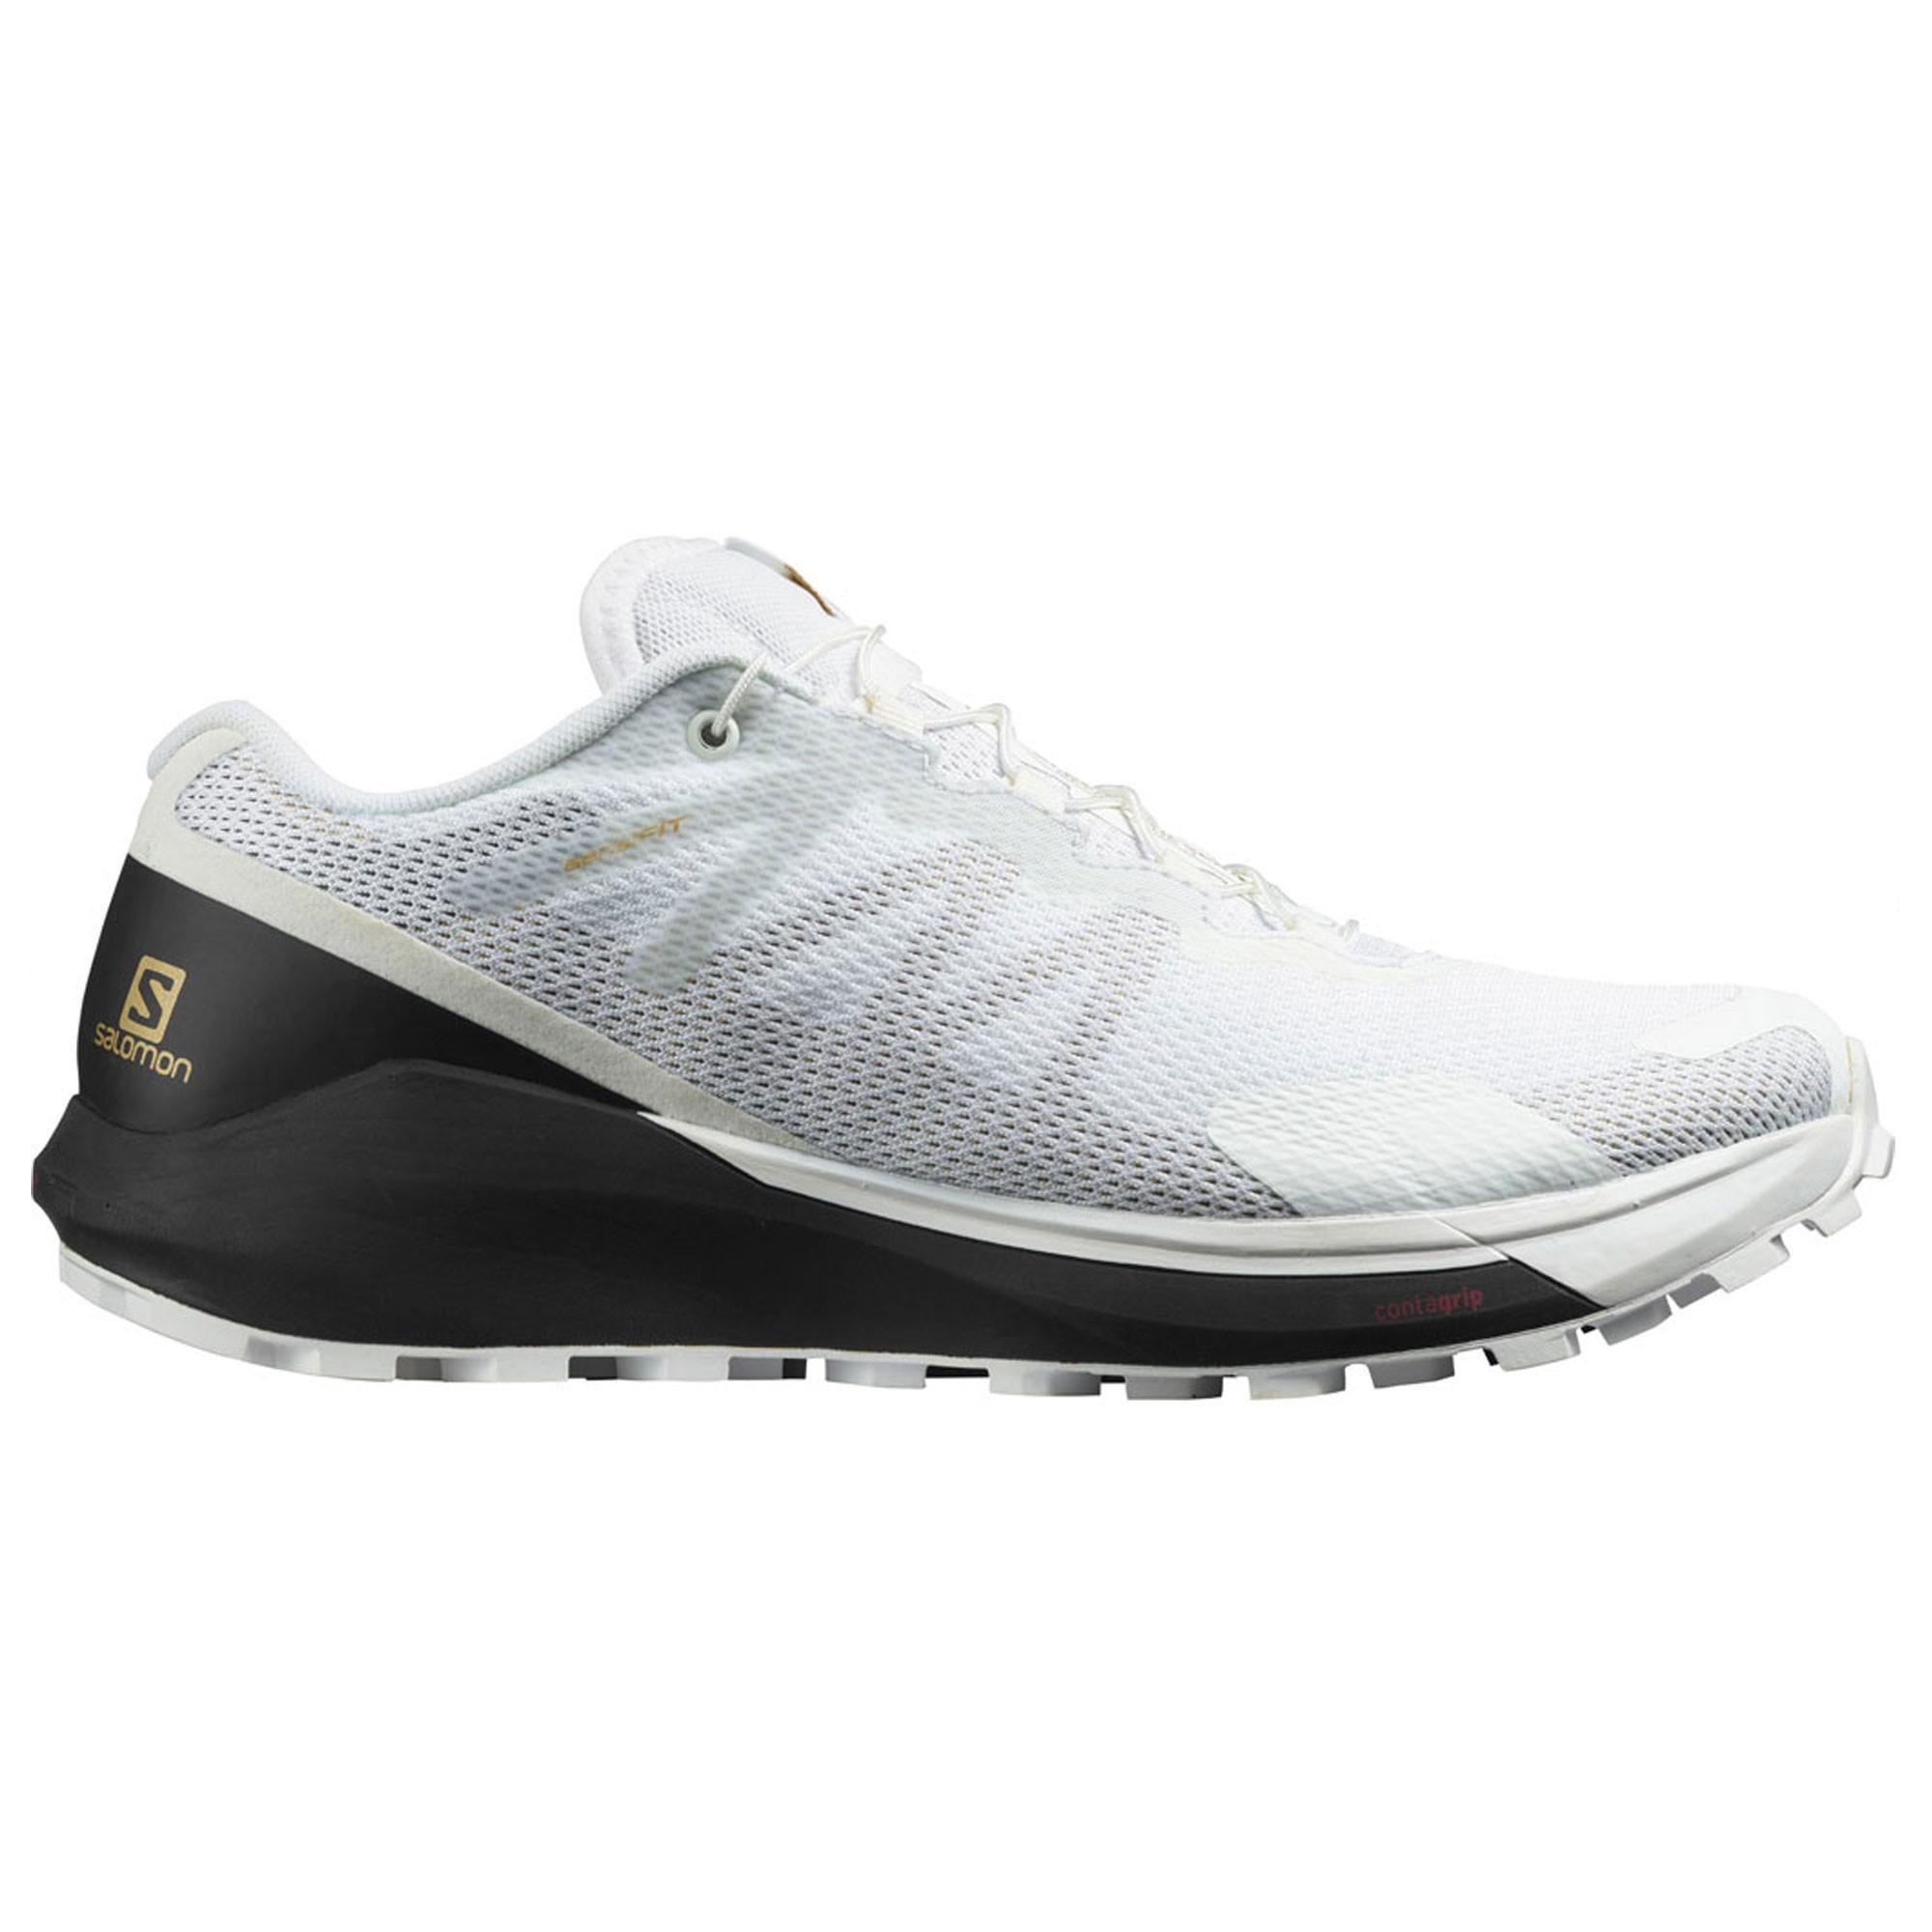 Ripples corpulento alluvione  Salomon LTD Edition Sense Ride 3 Womens Trail Running Shoes | Sigma Sports